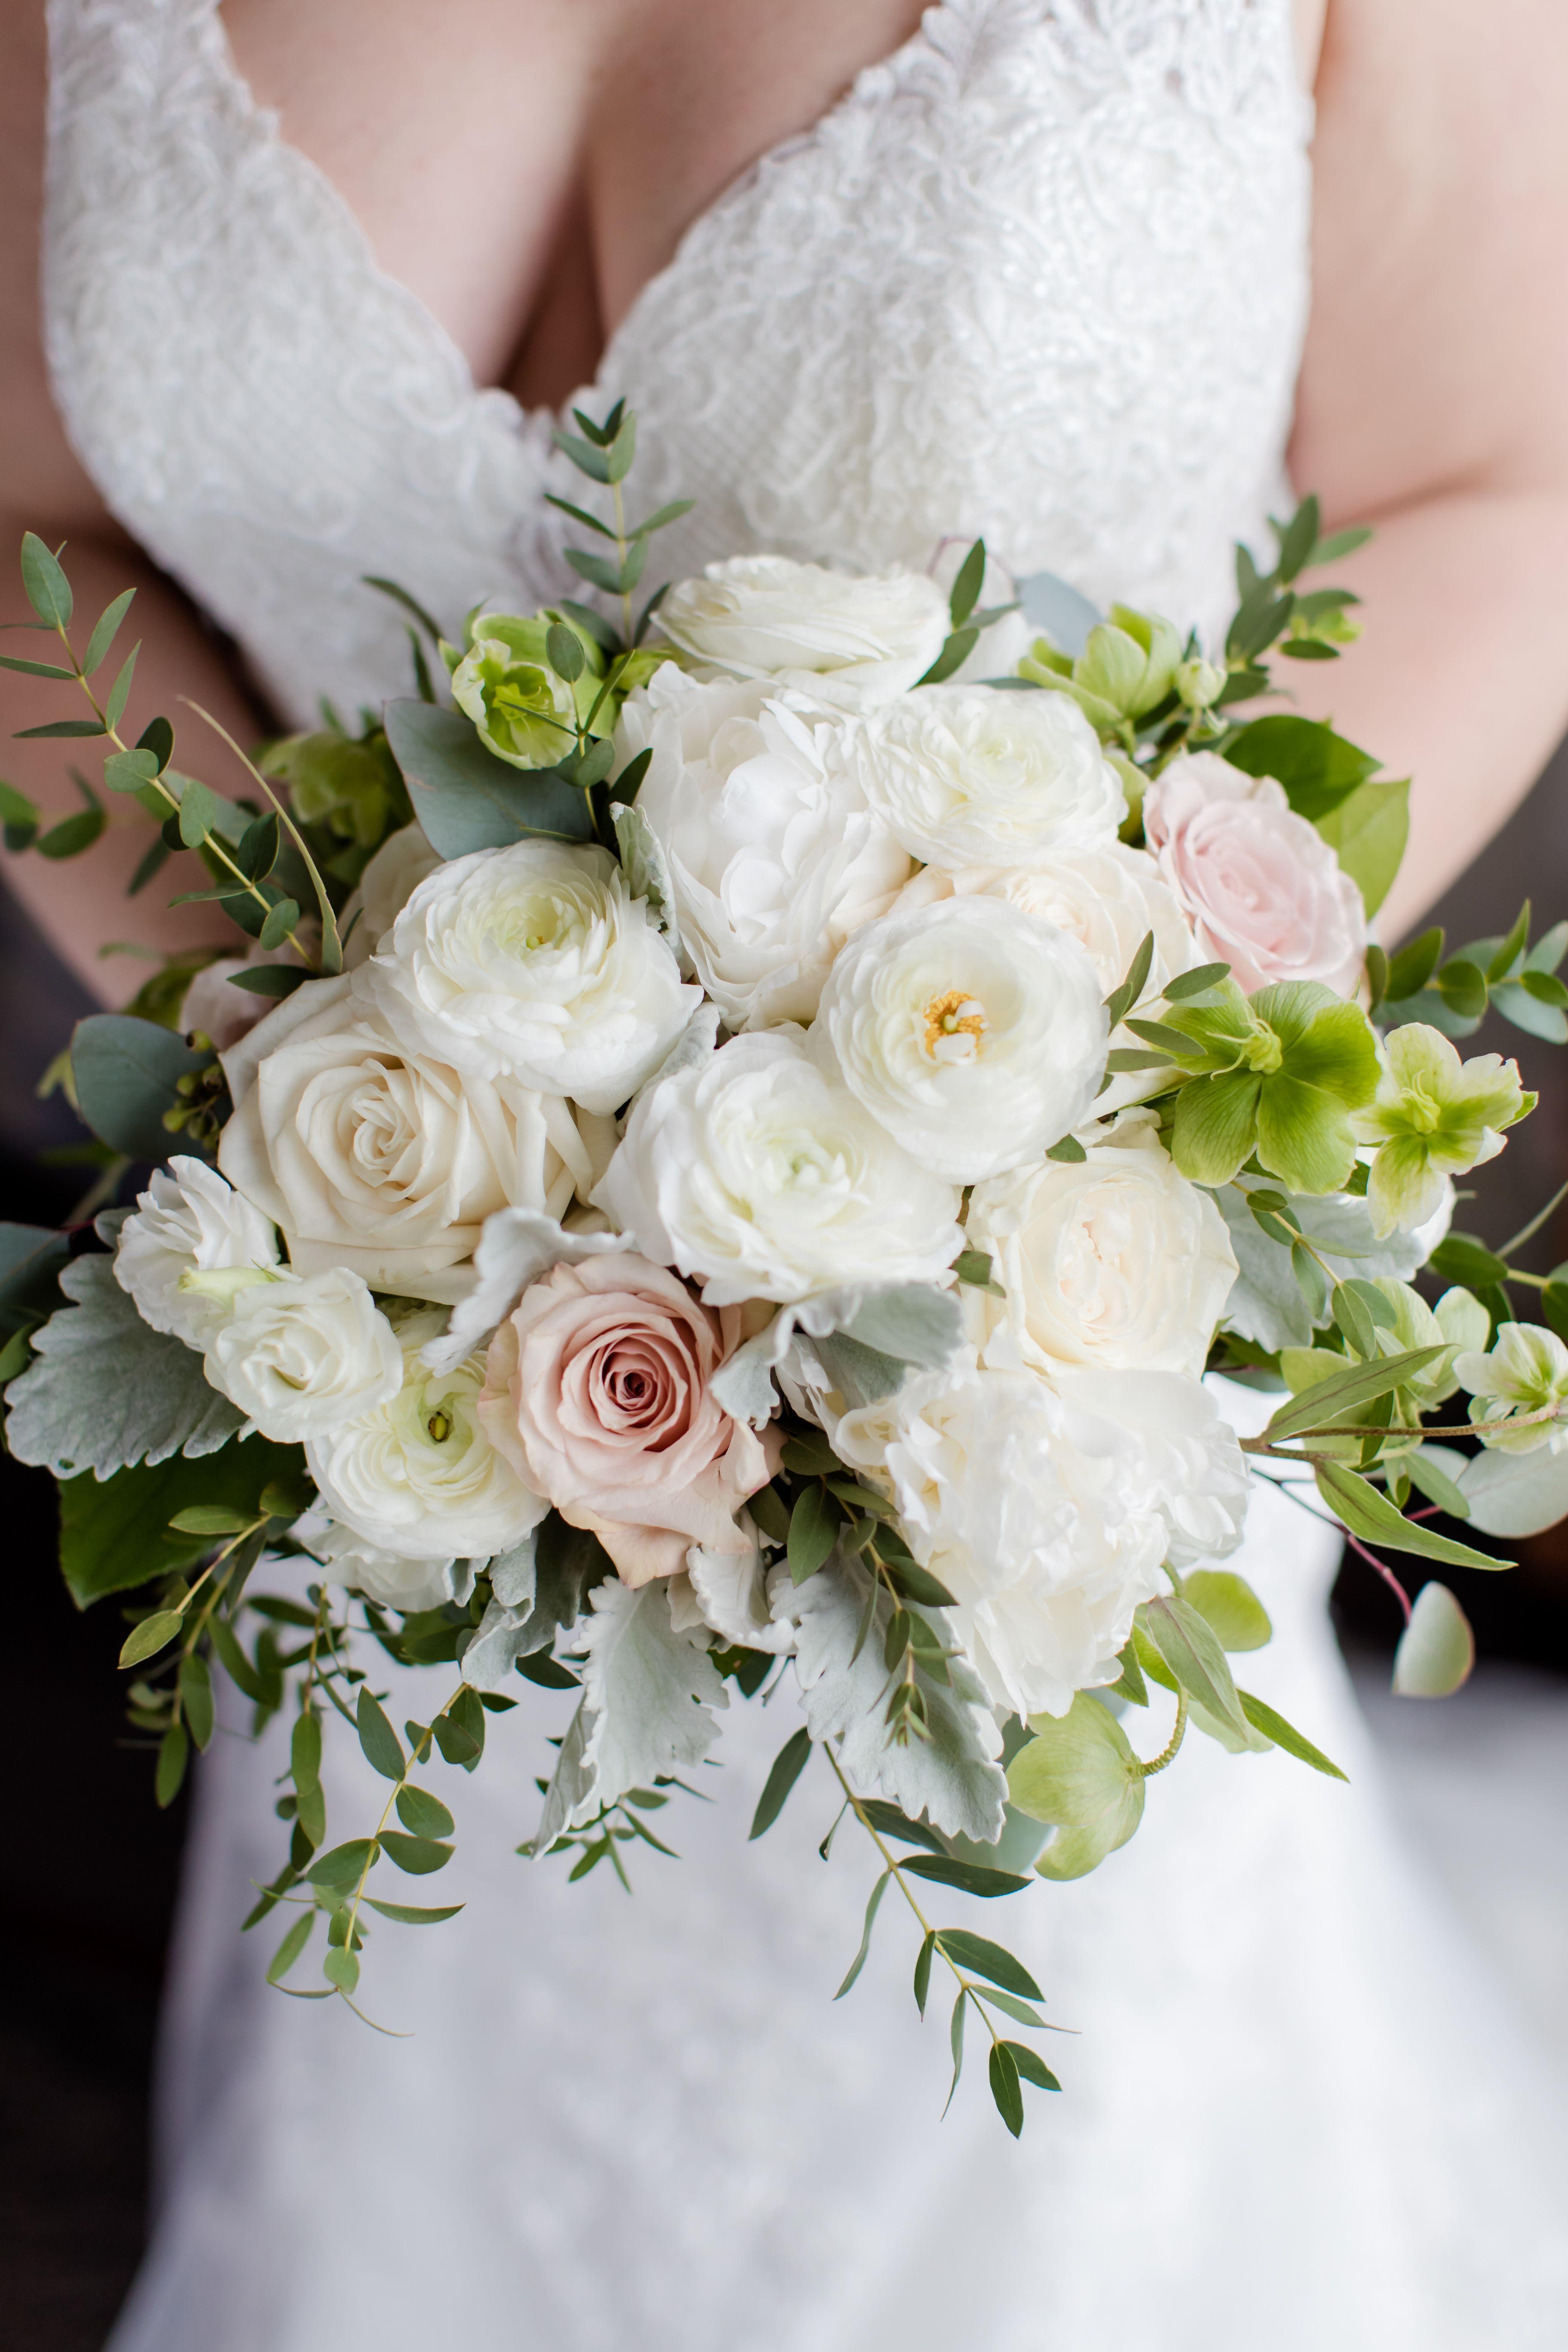 Beautiful bridal bouquet wedding flowers cost flower